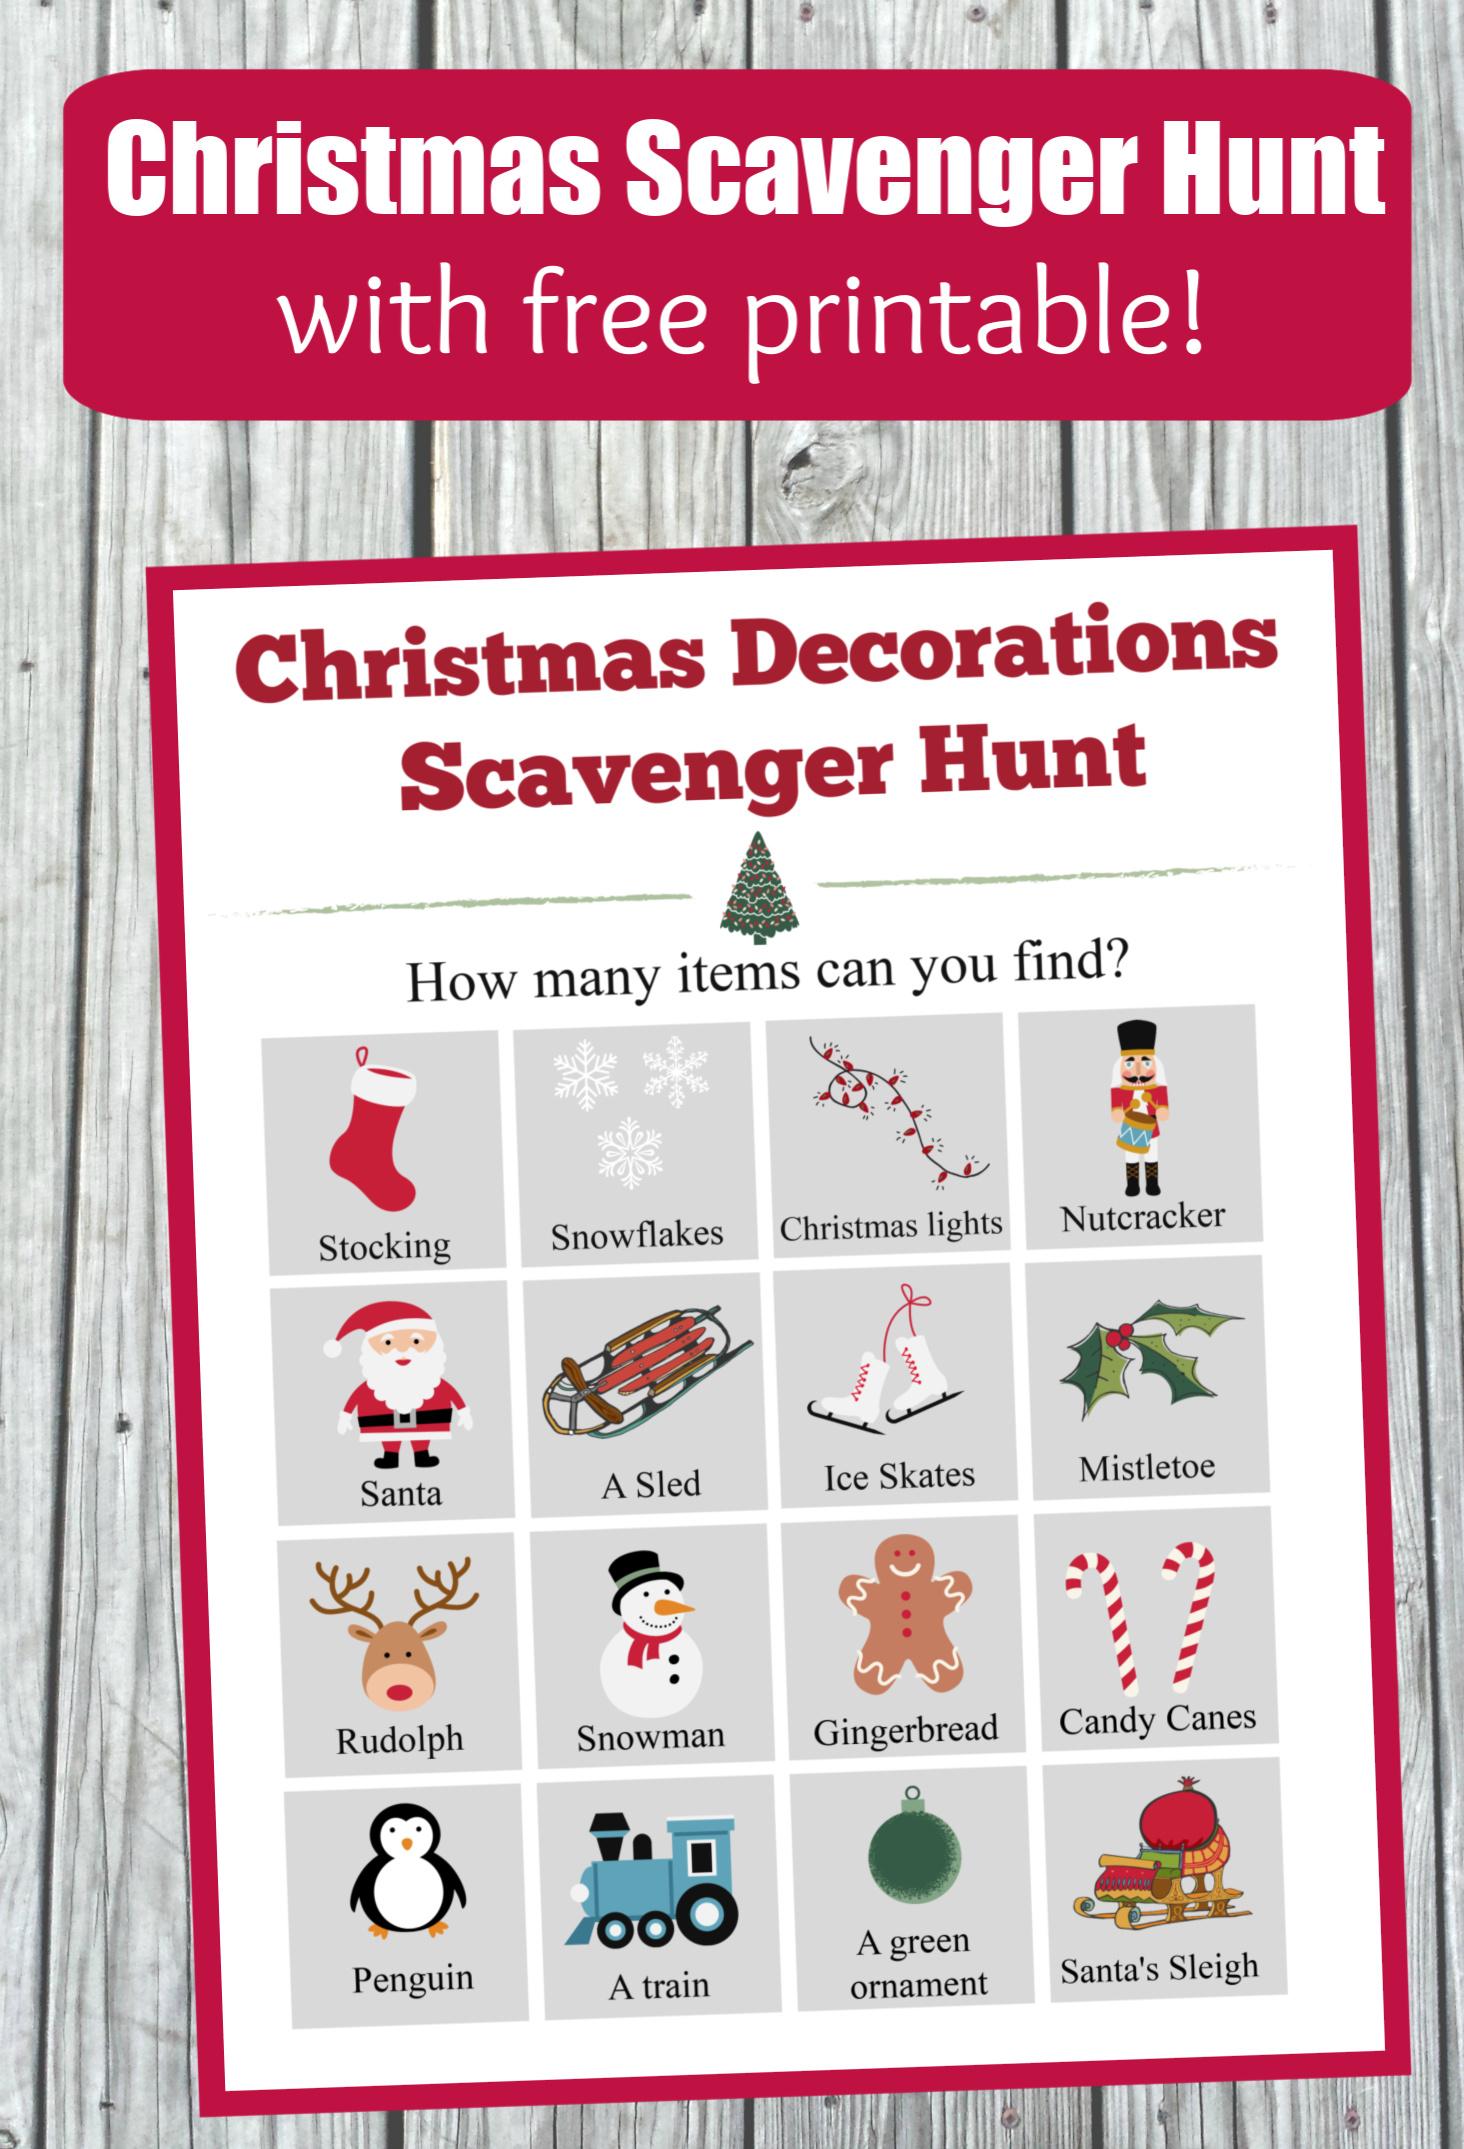 Free Printable Christmas Scavenger Hunt Edventures With Kids